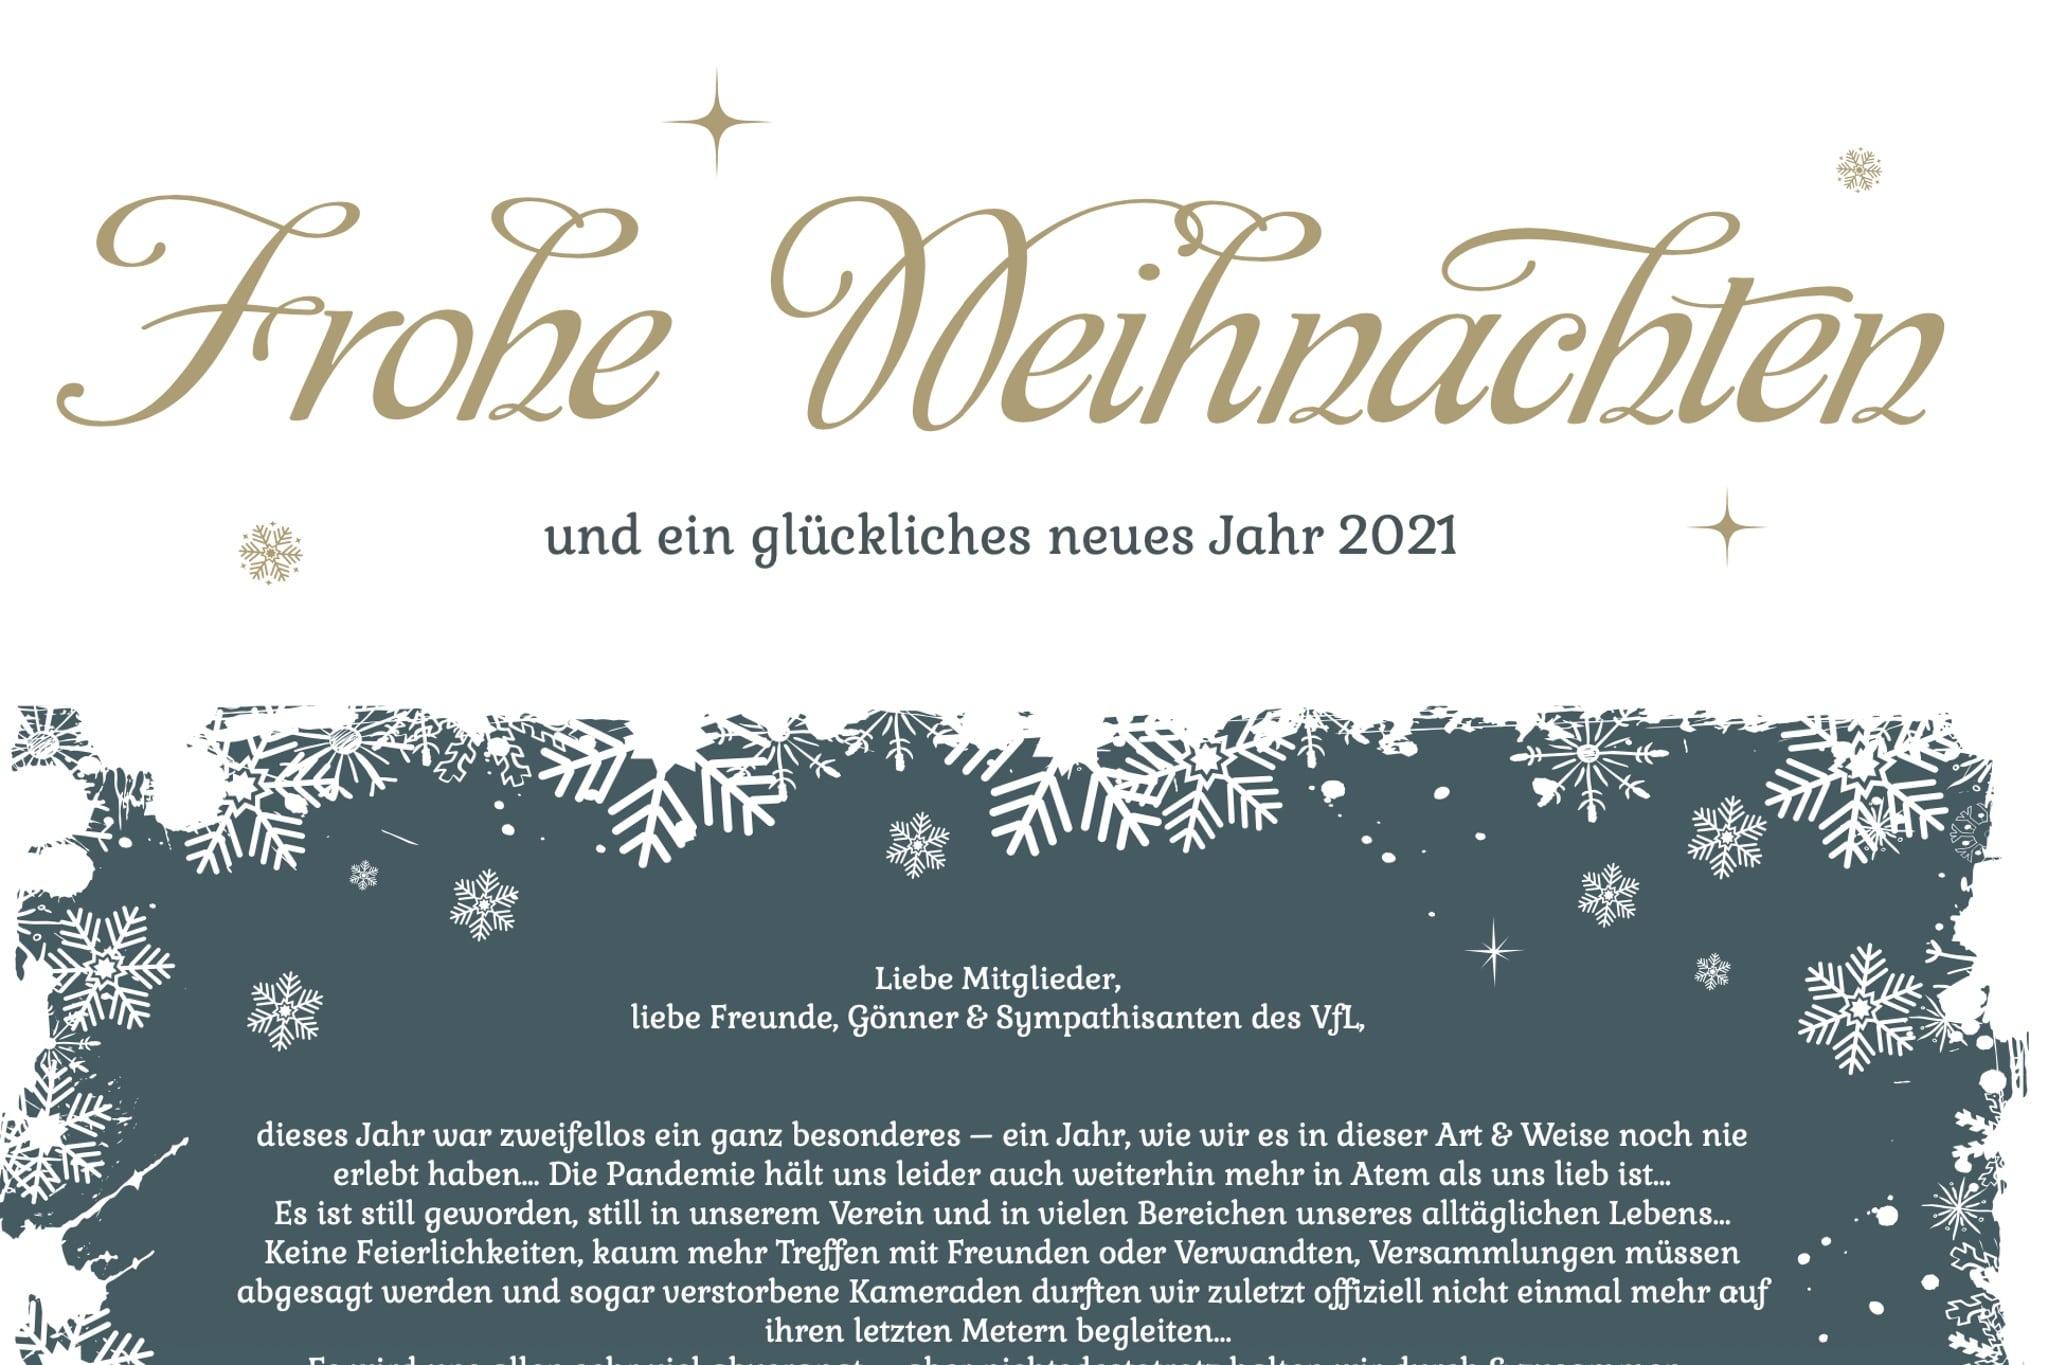 Der VfL wünscht frohe Weihnachten